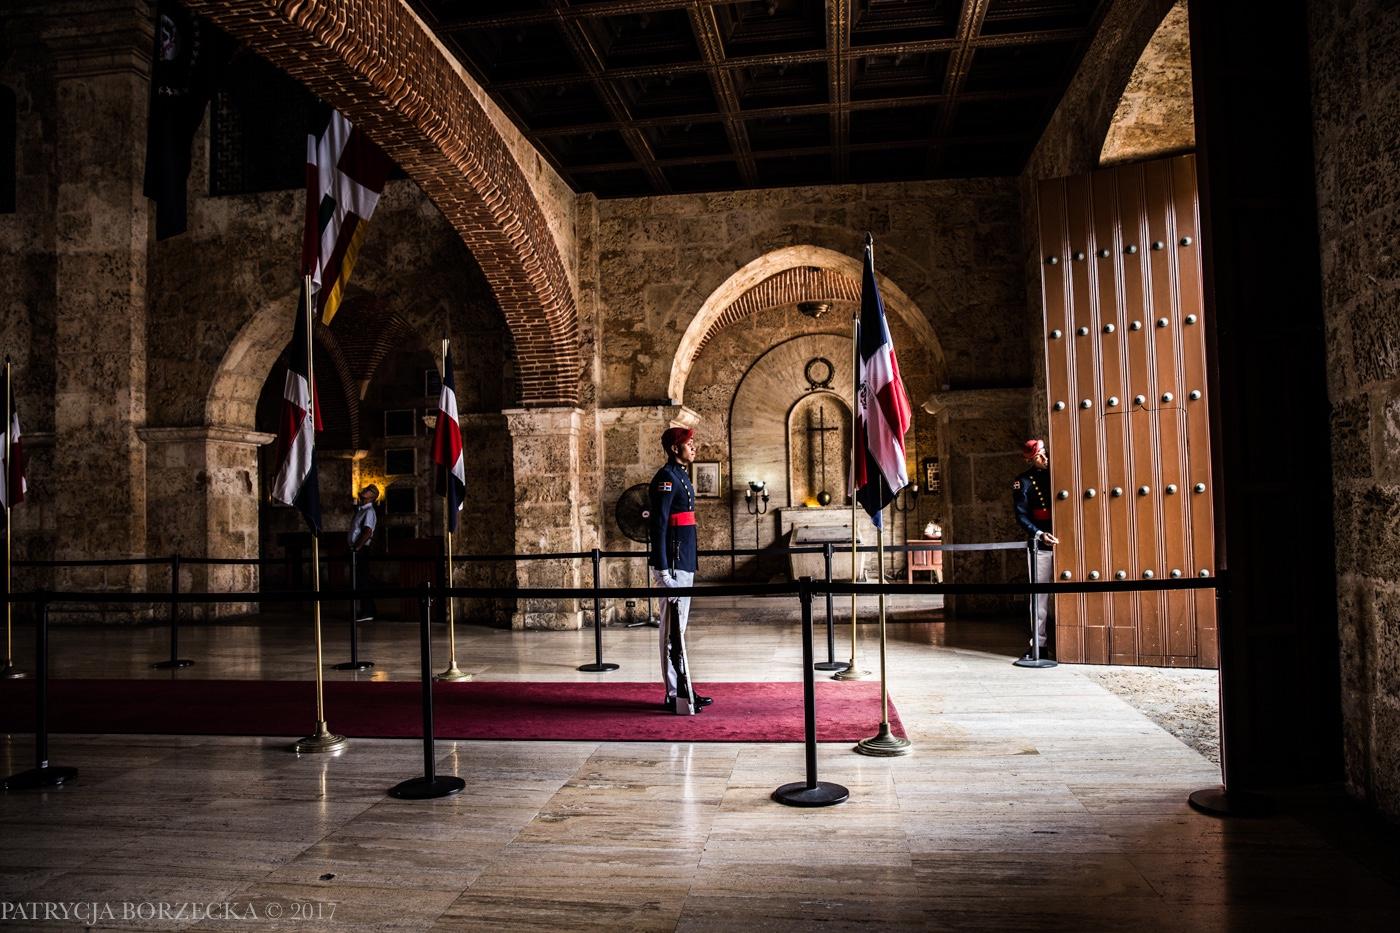 Patrycja-Borzecka-Photo-Santo-Domingo-Zona-Colonial-09